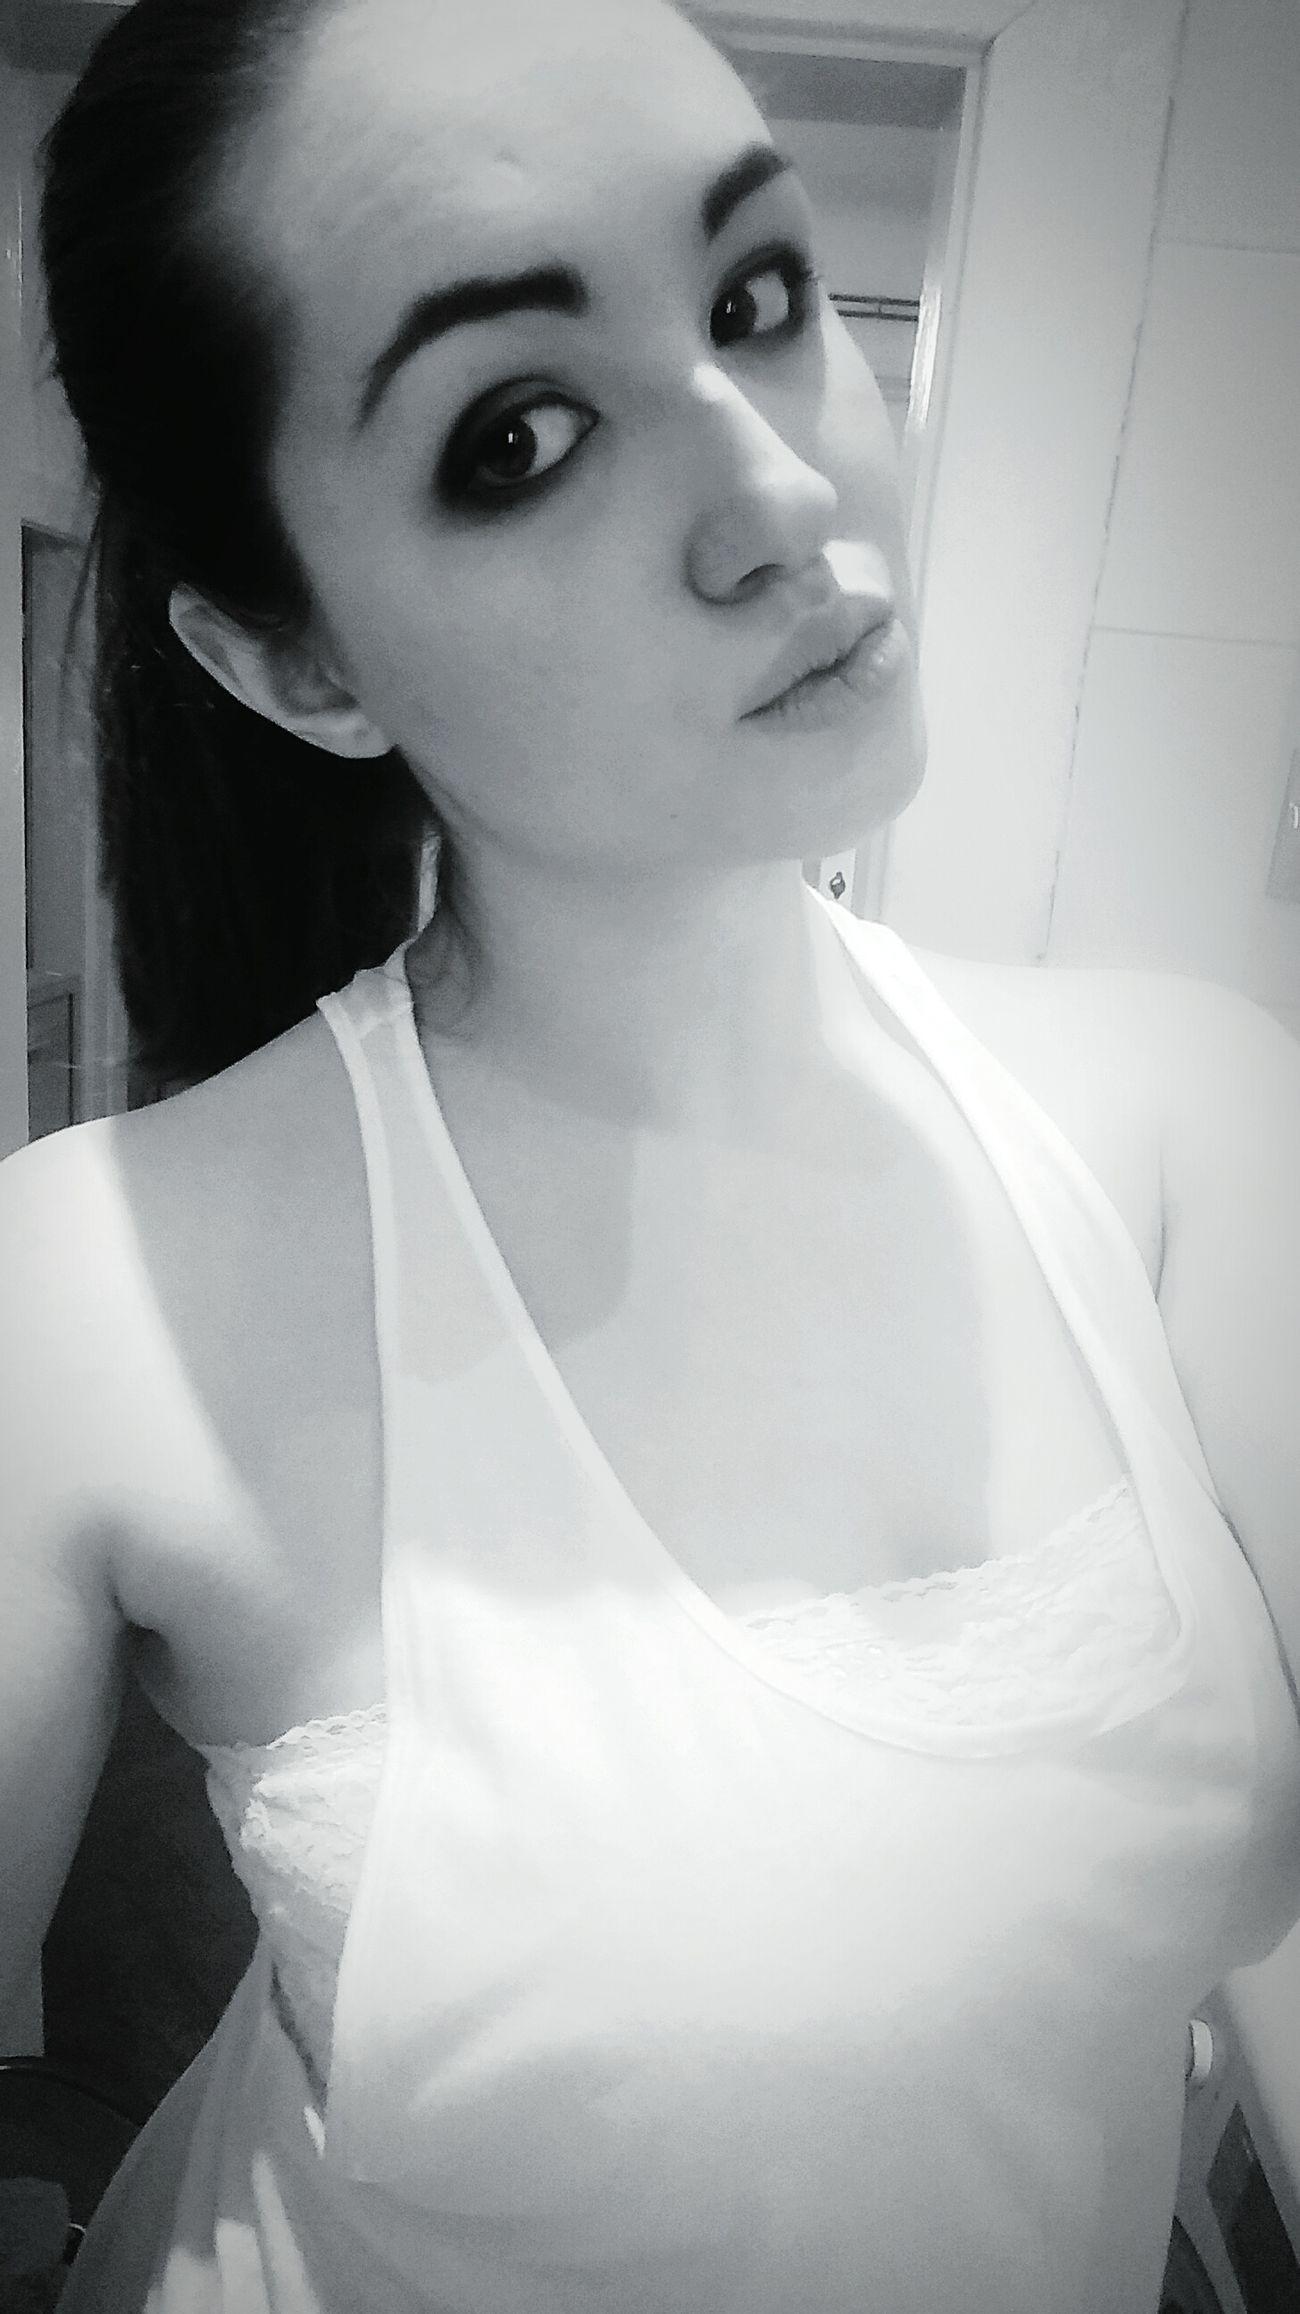 Sexywomen Adult EyeEm Girl Of The Day Woman Hottie Girl Pretty Girl Hottie Portrait Of A Woman Sexylips SexyGirl.♥ Hotties Followme EyeEmGIRLS Young Women Hot_shotz SexyAsFuck Eyeemgirl Sweet Girlselfie Long Hair Sexy♡ Adults Only Doyoulikeit? Hotgirls Sexygirl